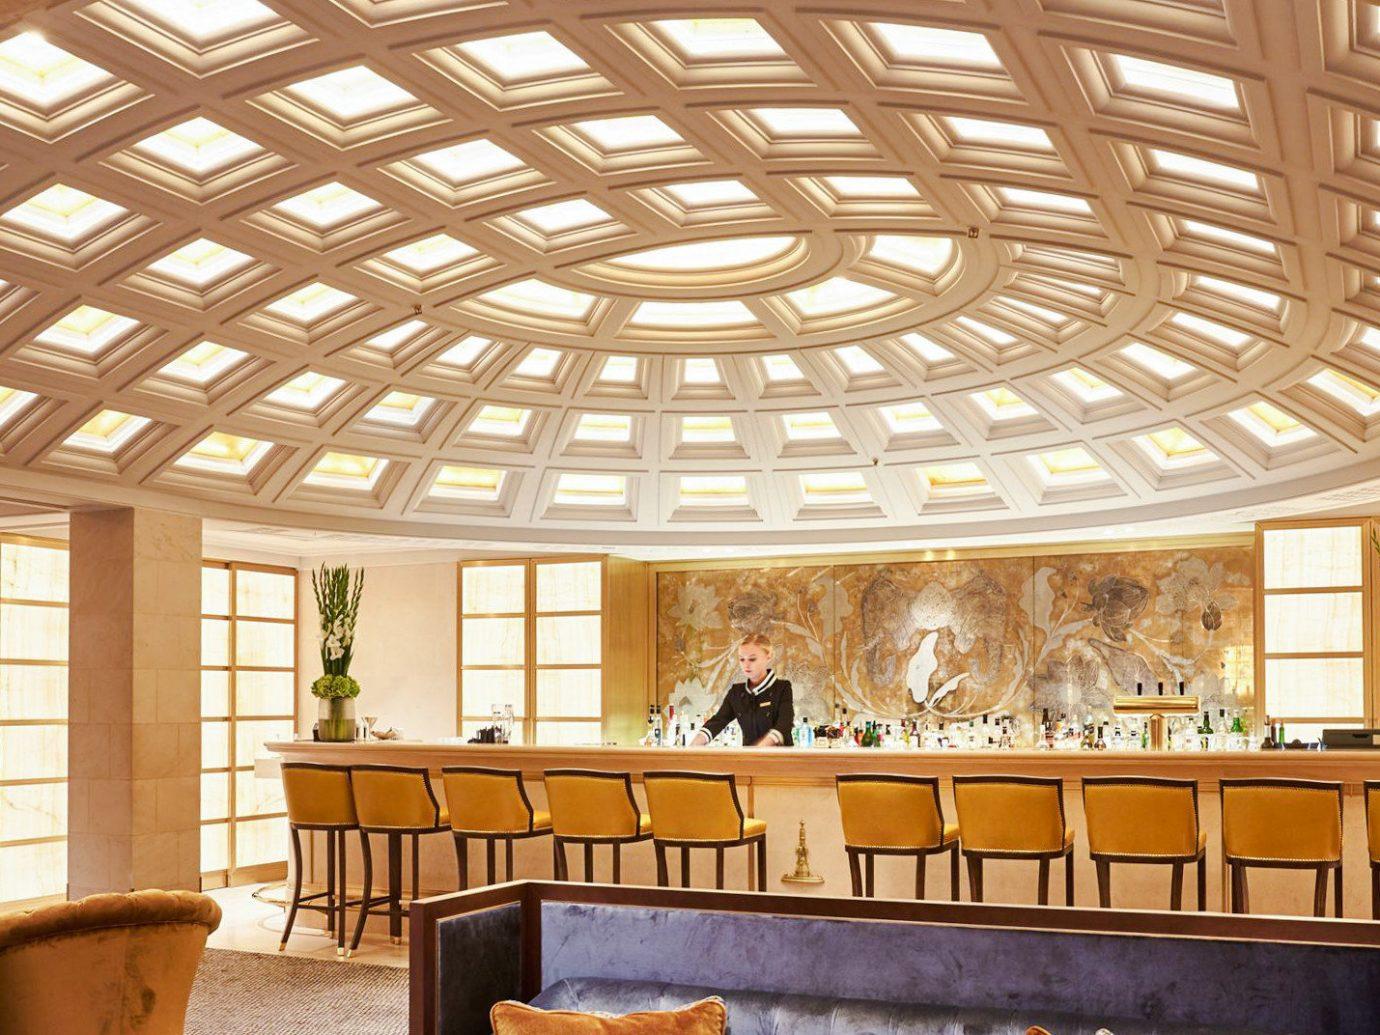 Berlin Boutique Hotels Germany Hotels Luxury Travel indoor ceiling window floor chair building room interior design daylighting Lobby roof estate furniture real estate beam